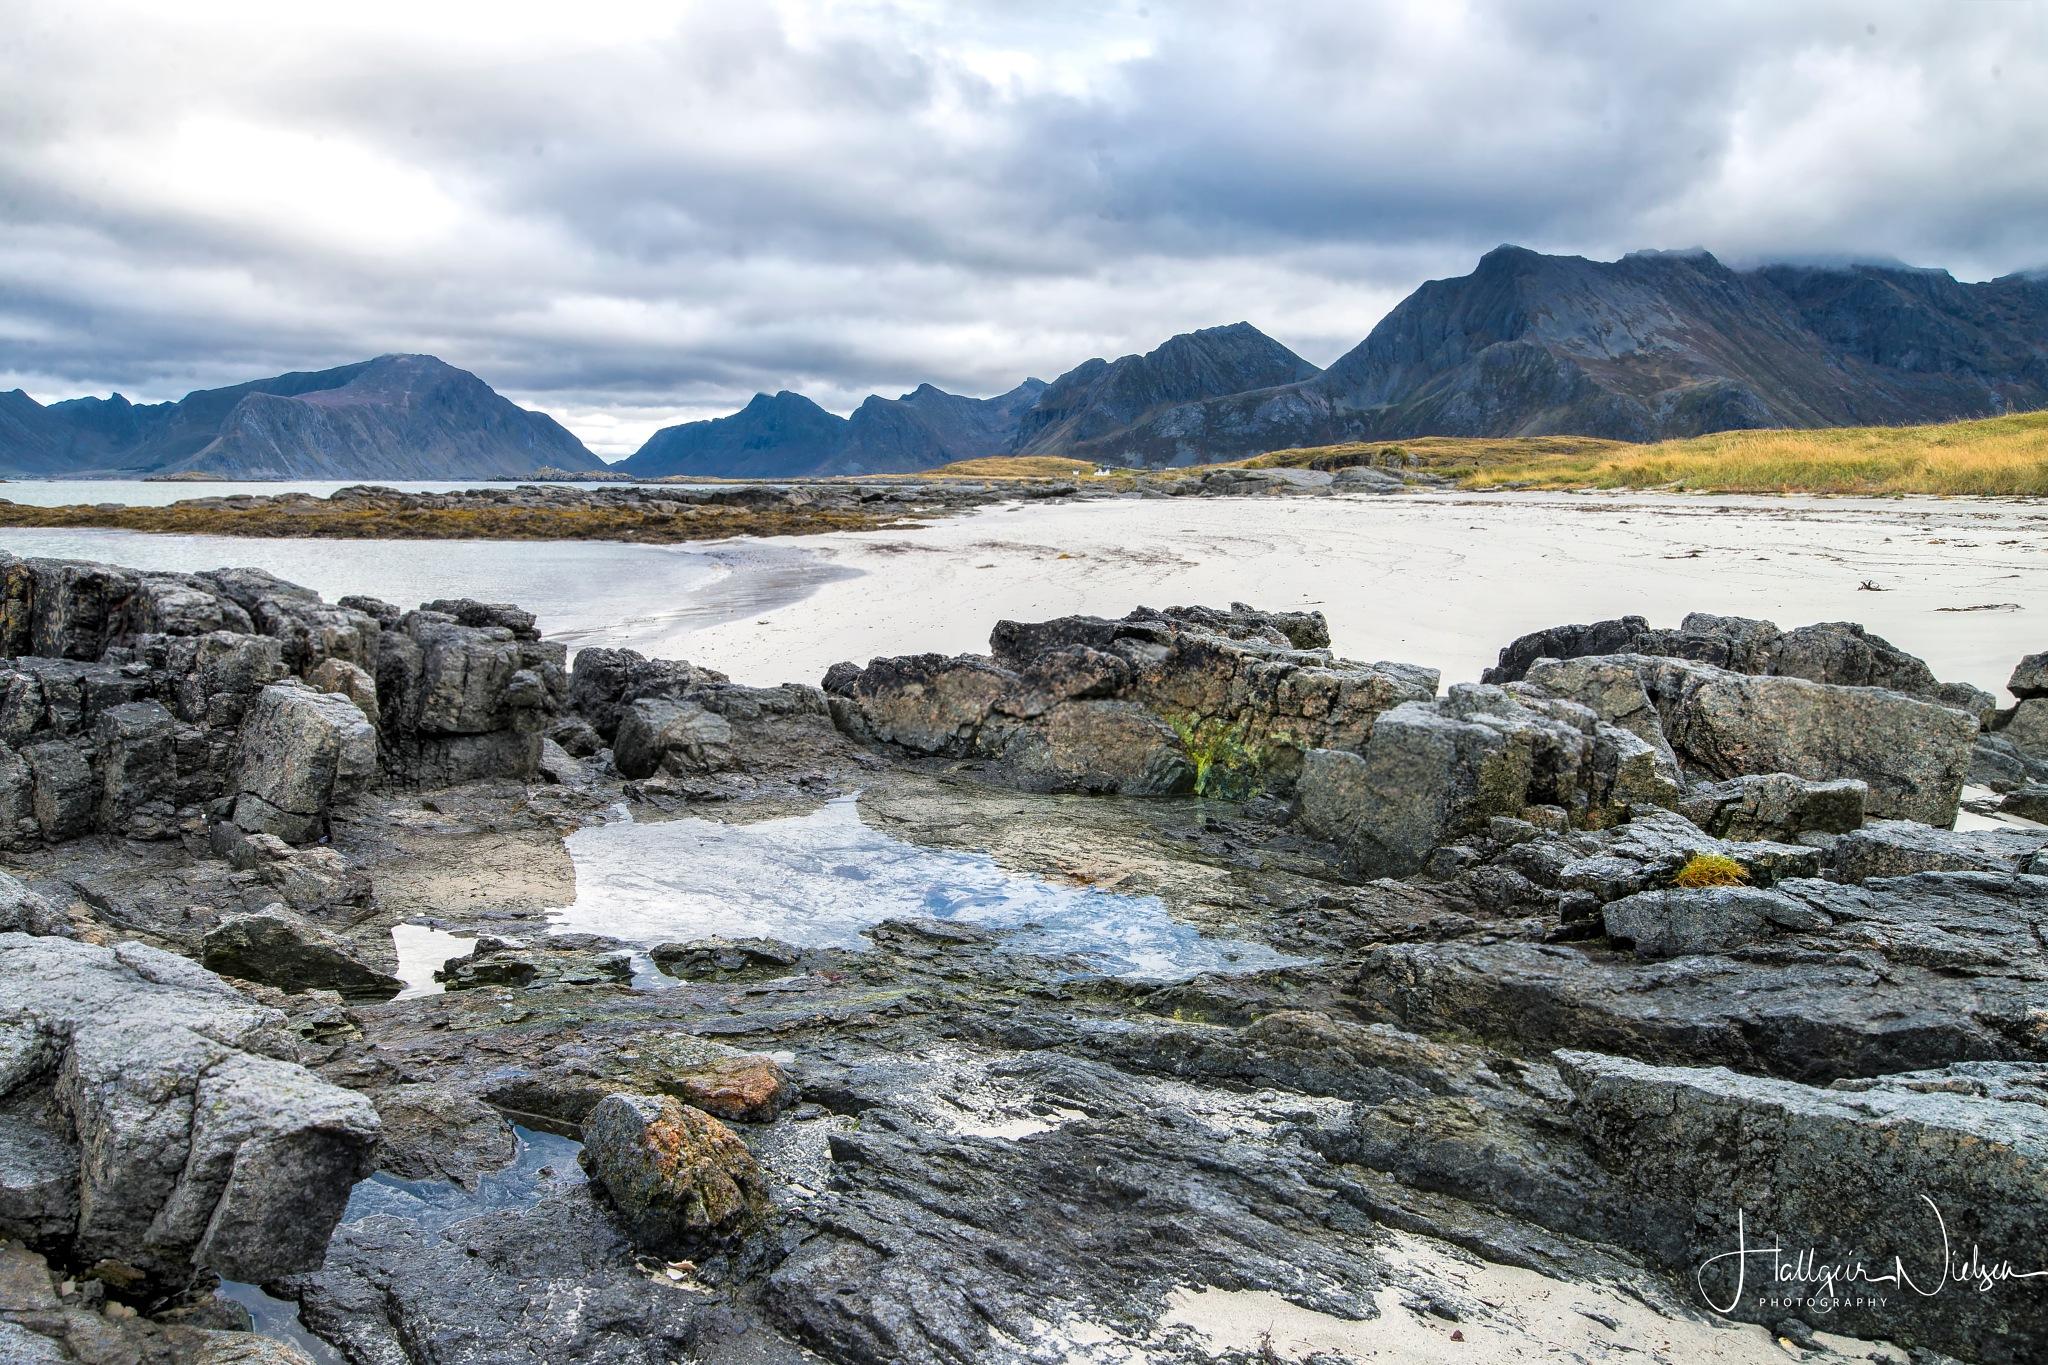 Lofoten Beaches by Hallgeir Nielsen